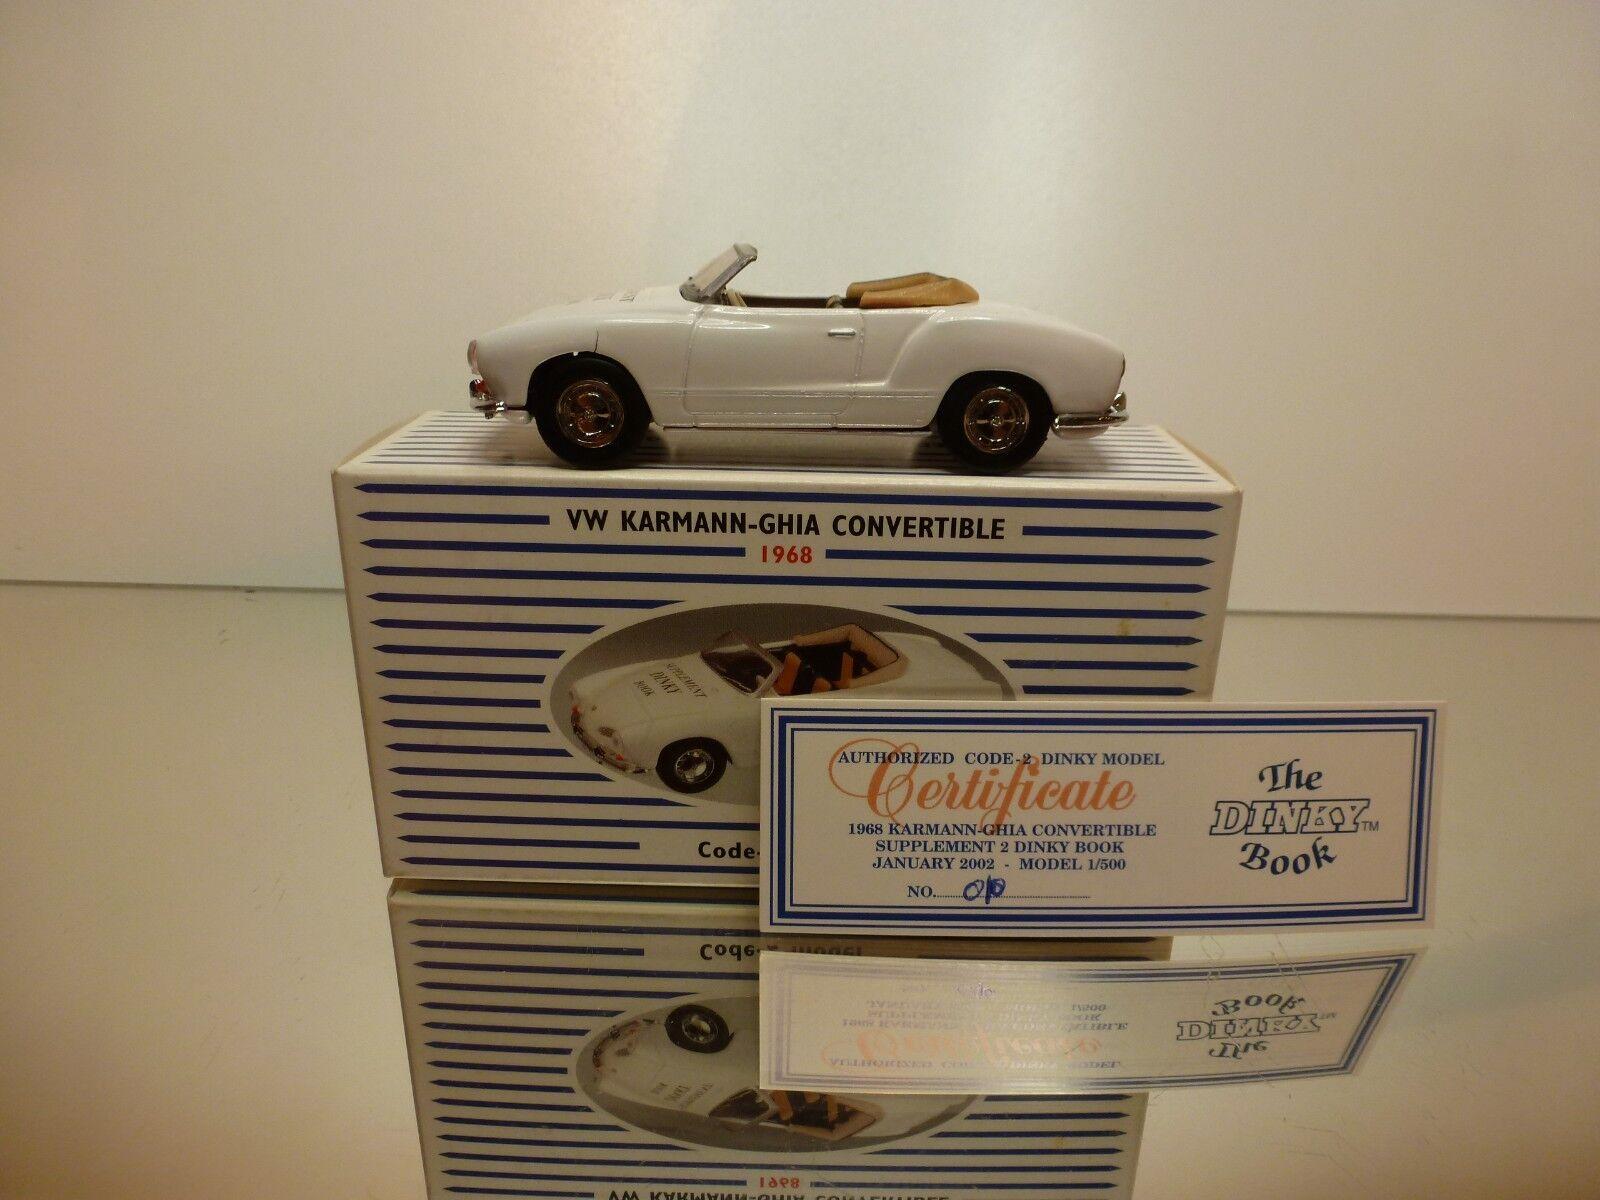 DINKY TOYS 00-5 VW VOLKSWAGEN KARMANN GHIA - WHITE 1 43 RARE - VERY GOOD IN BOX